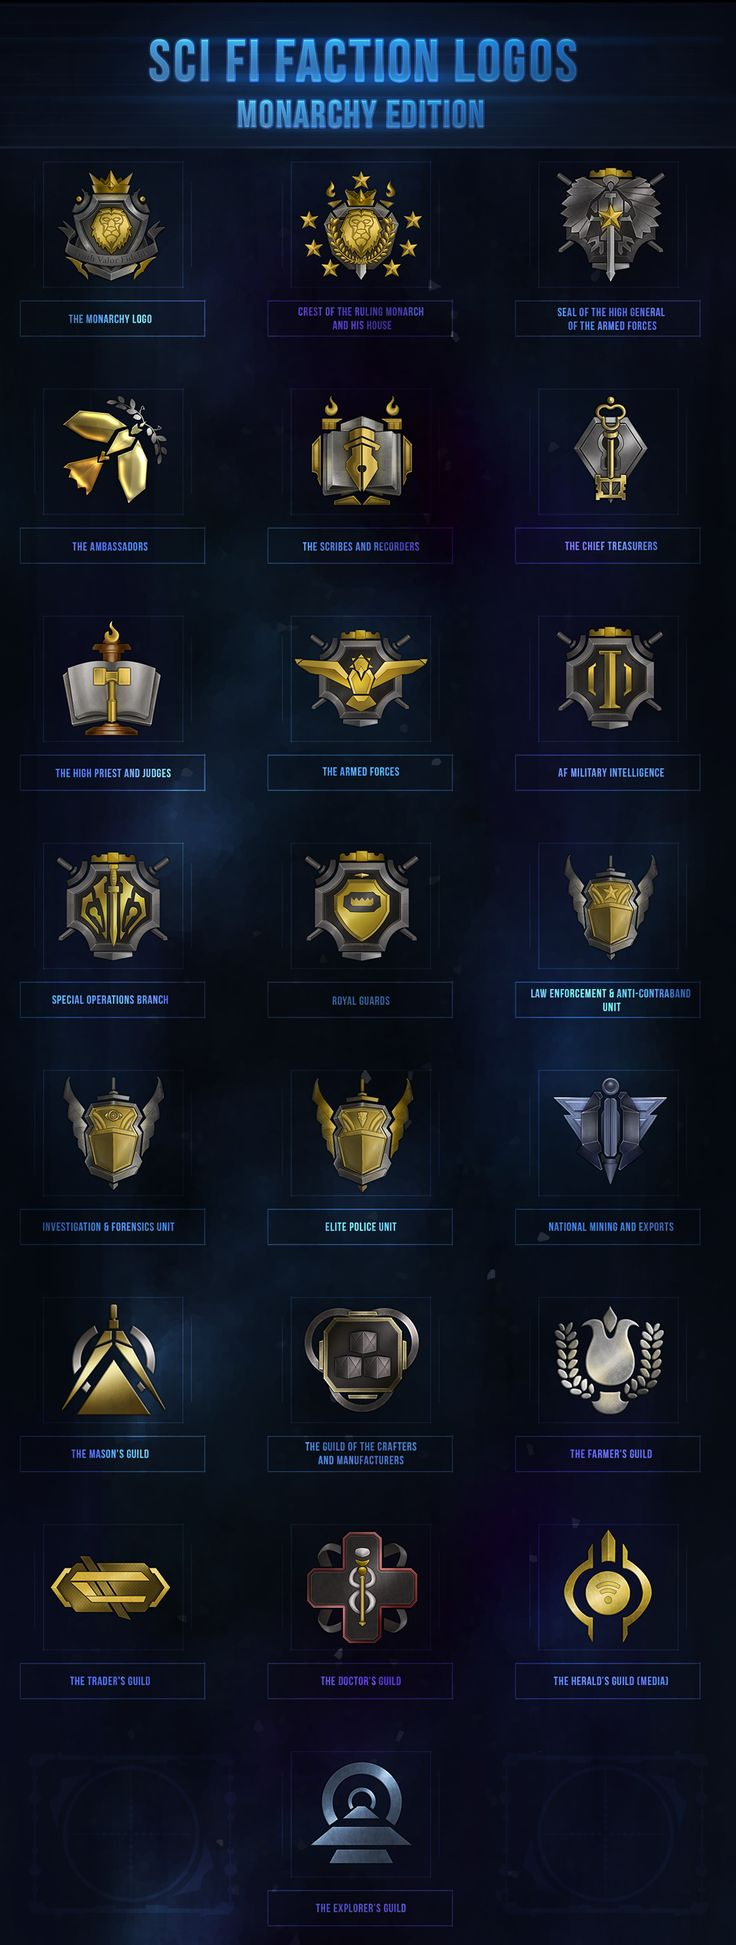 Sci-Fi Faction Logos - Monarchy Edition by VengeanceMK1.deviantart.com on @DeviantArt